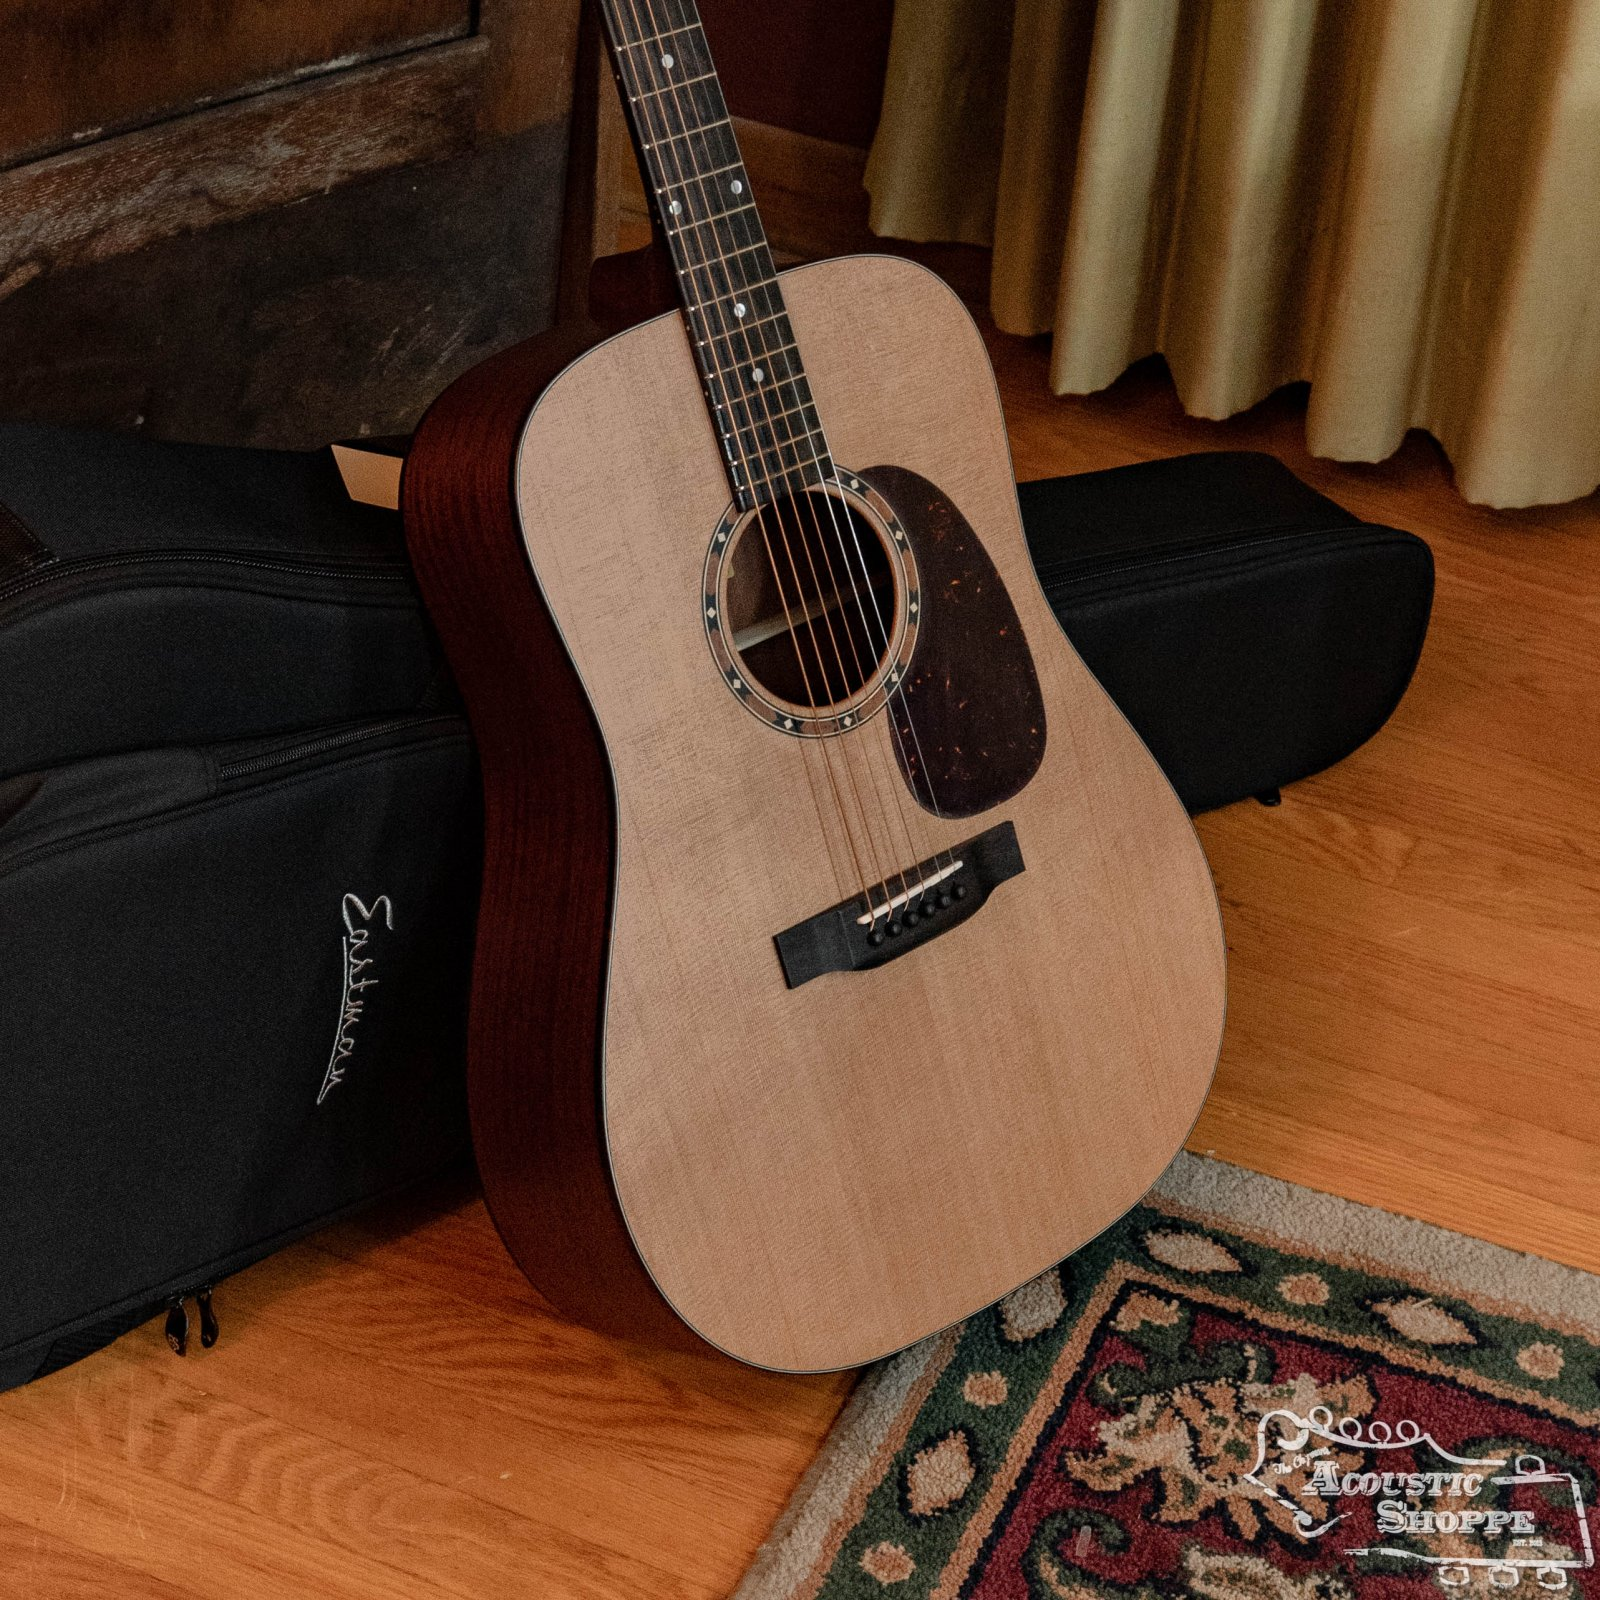 Eastman E2D Cedar/Sapele Dreadnought Guitar #2622